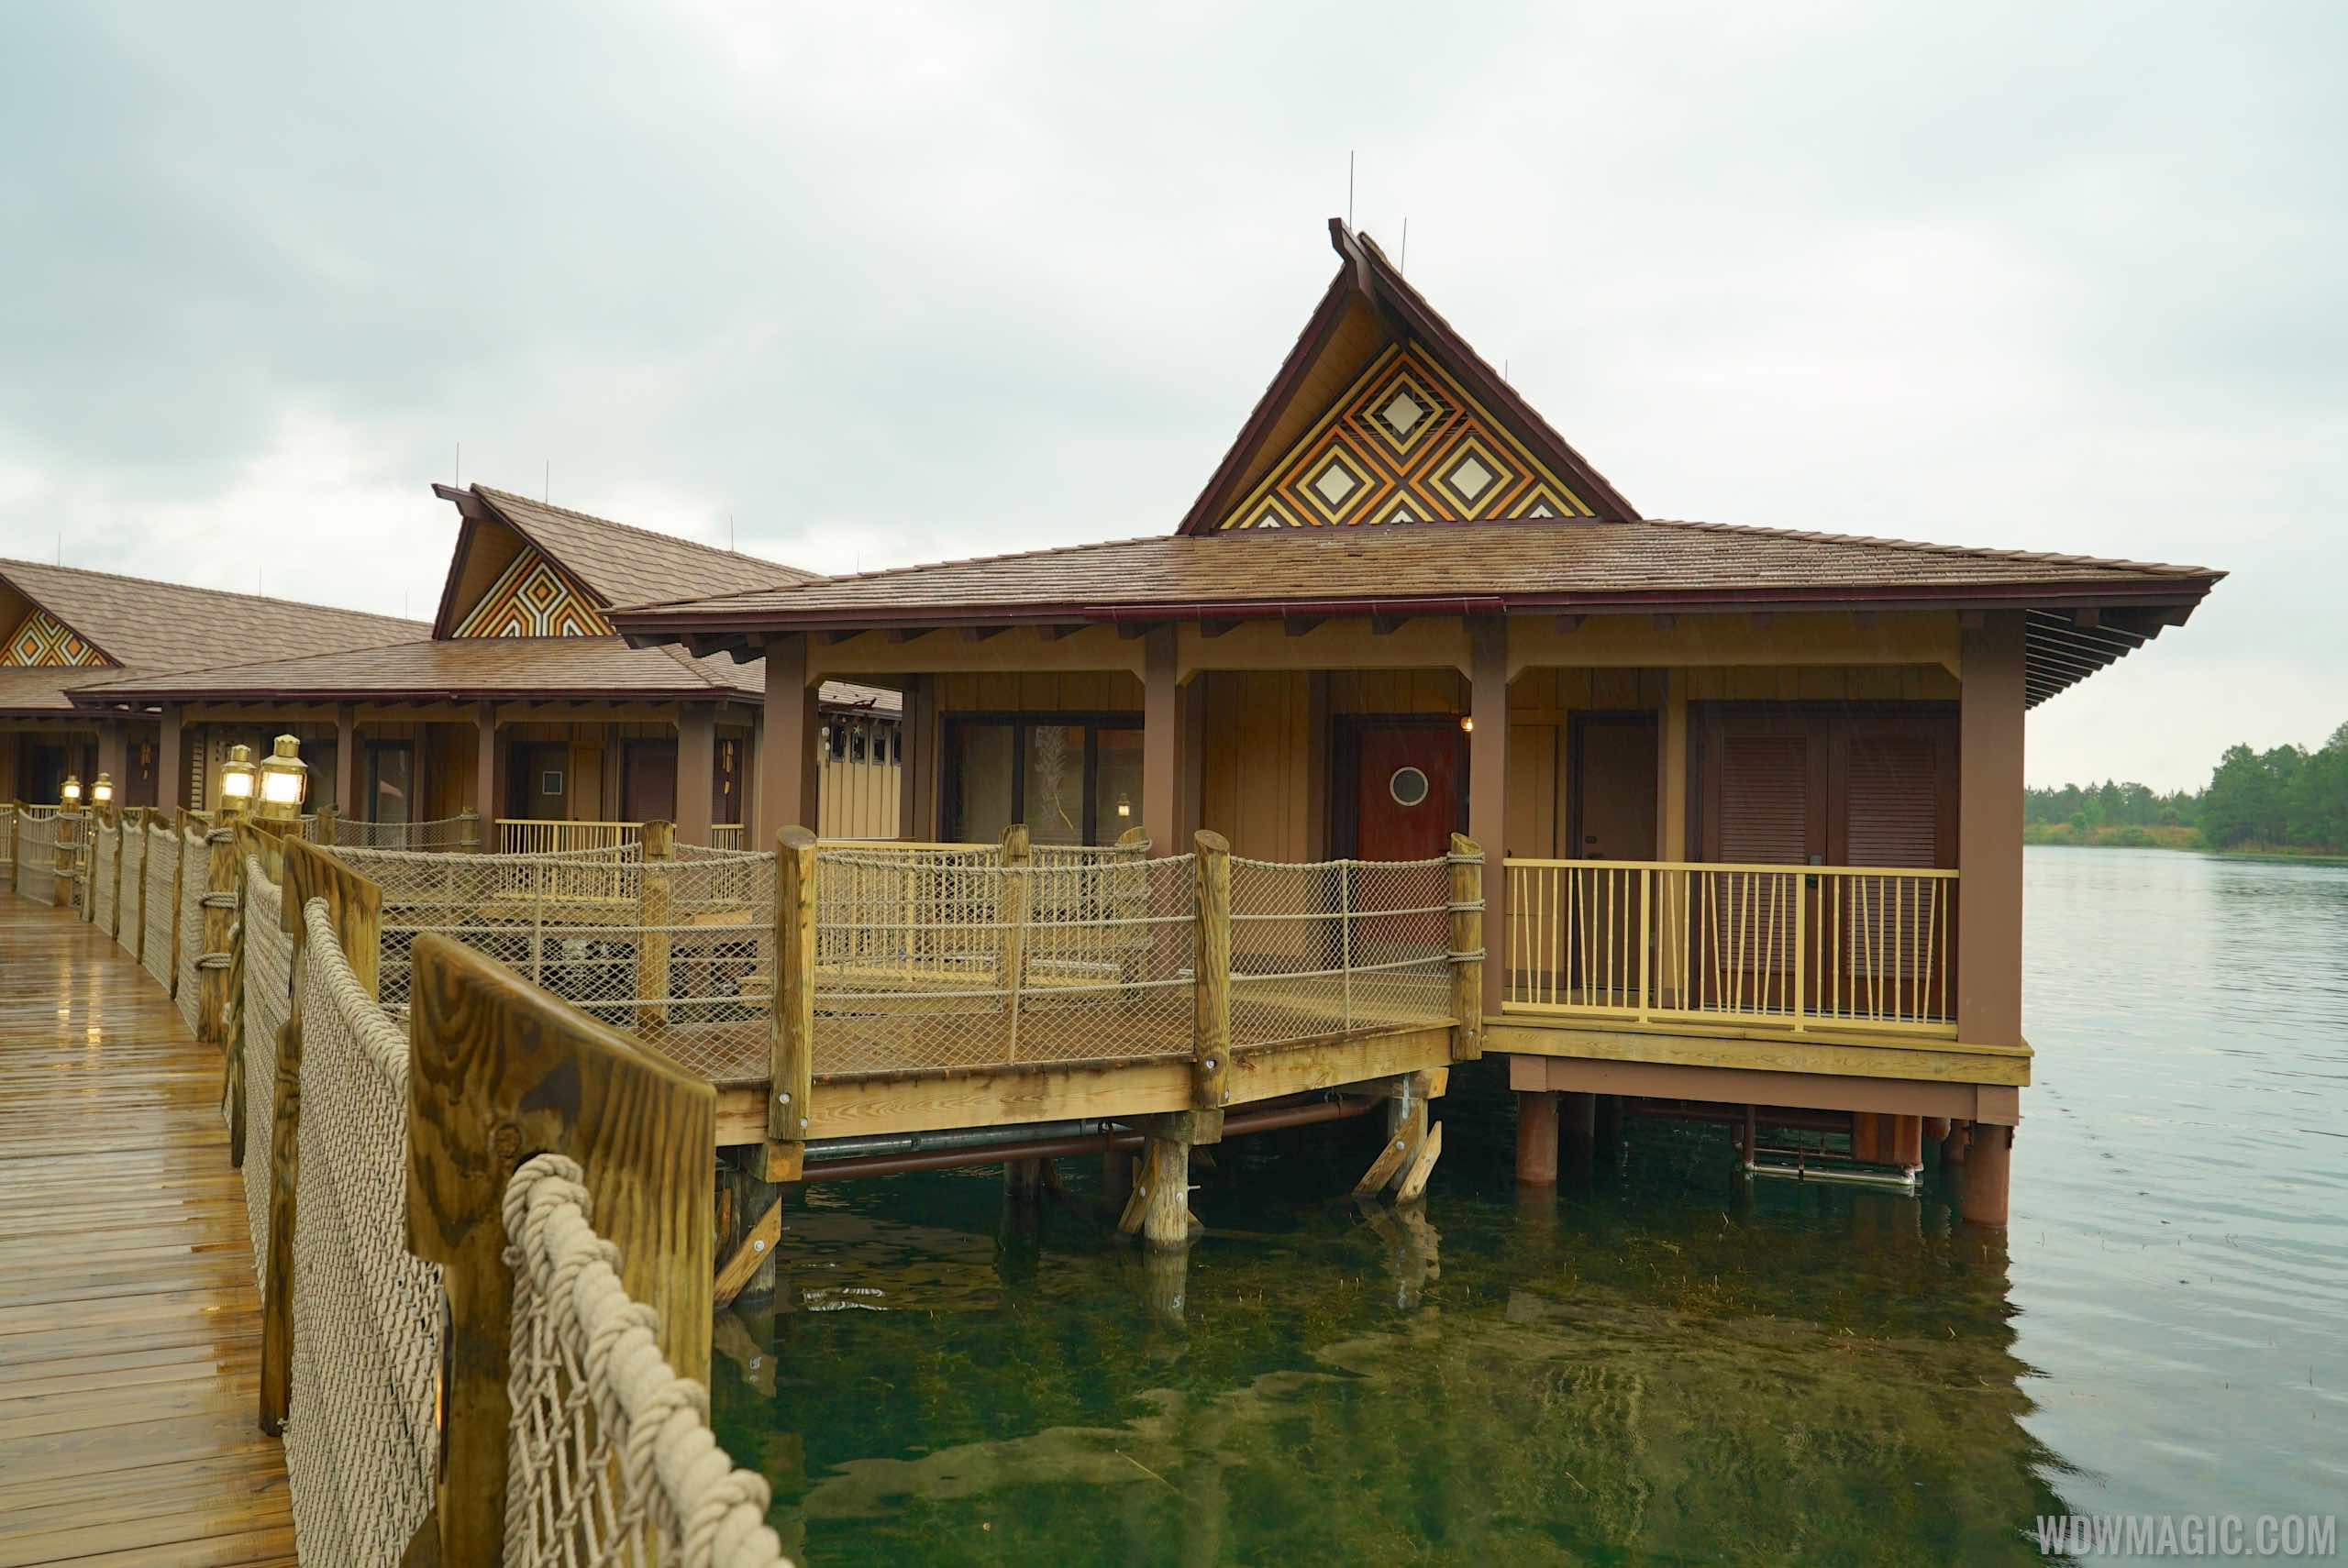 Disney's Polynesian Village Resort Bora Bora Bungalow - Bungalow frontage